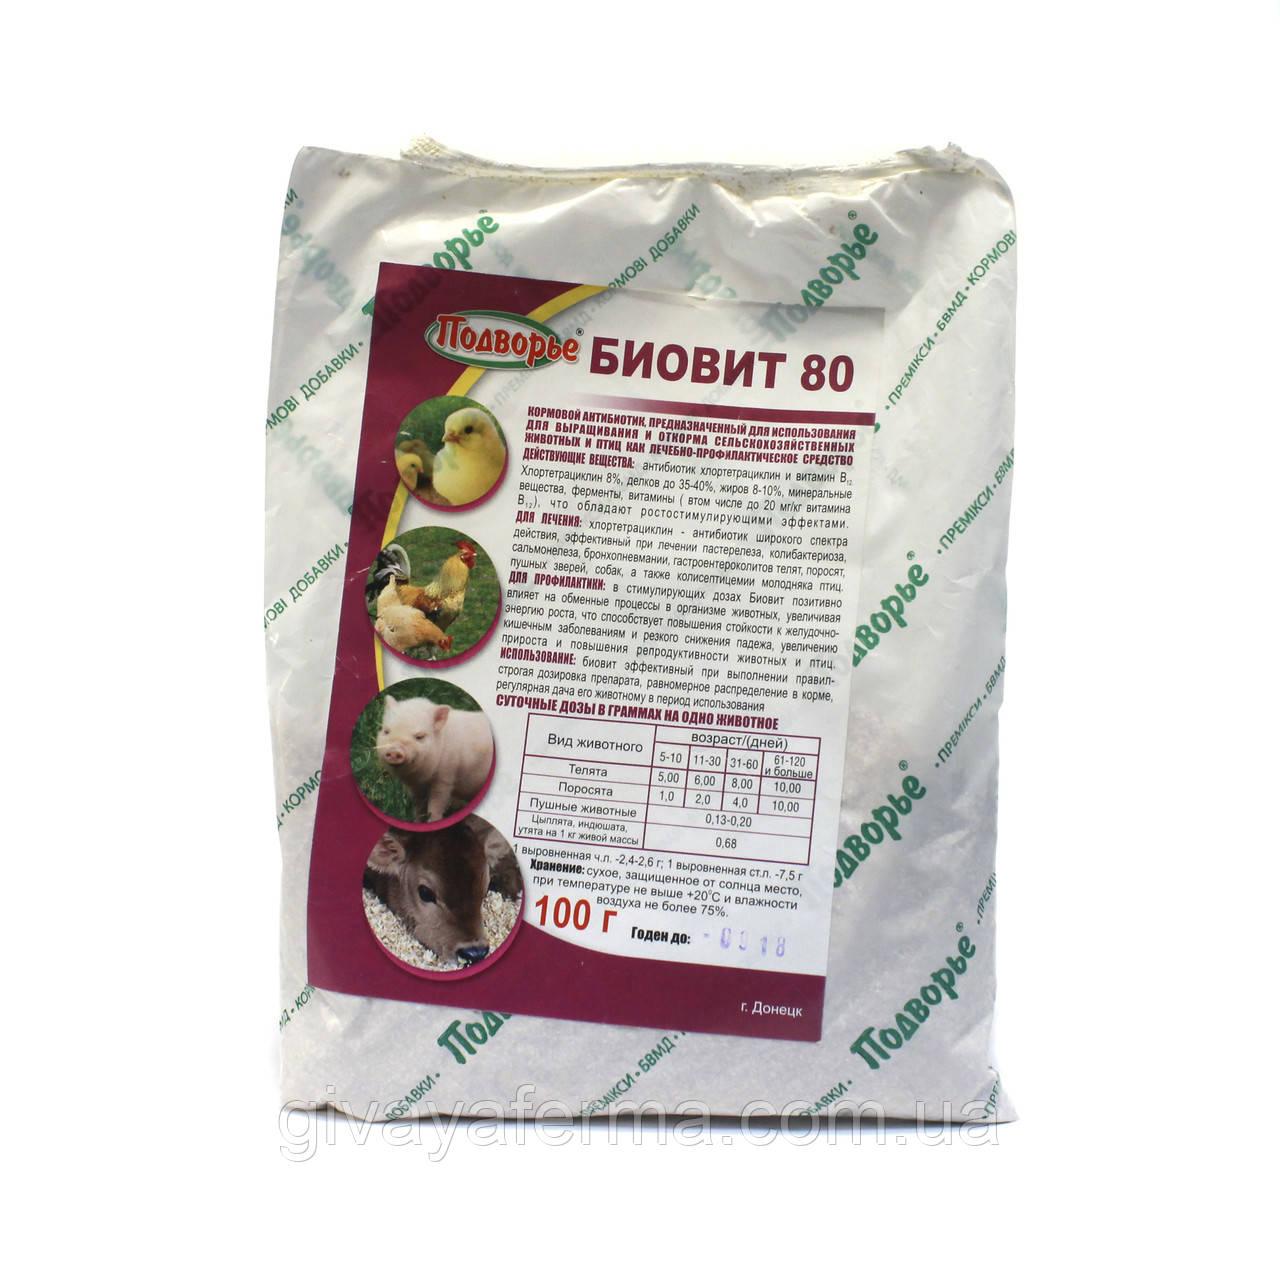 Кормовой антибиотик Биовит-80, 100 гр, для сельхоз животных и птиц